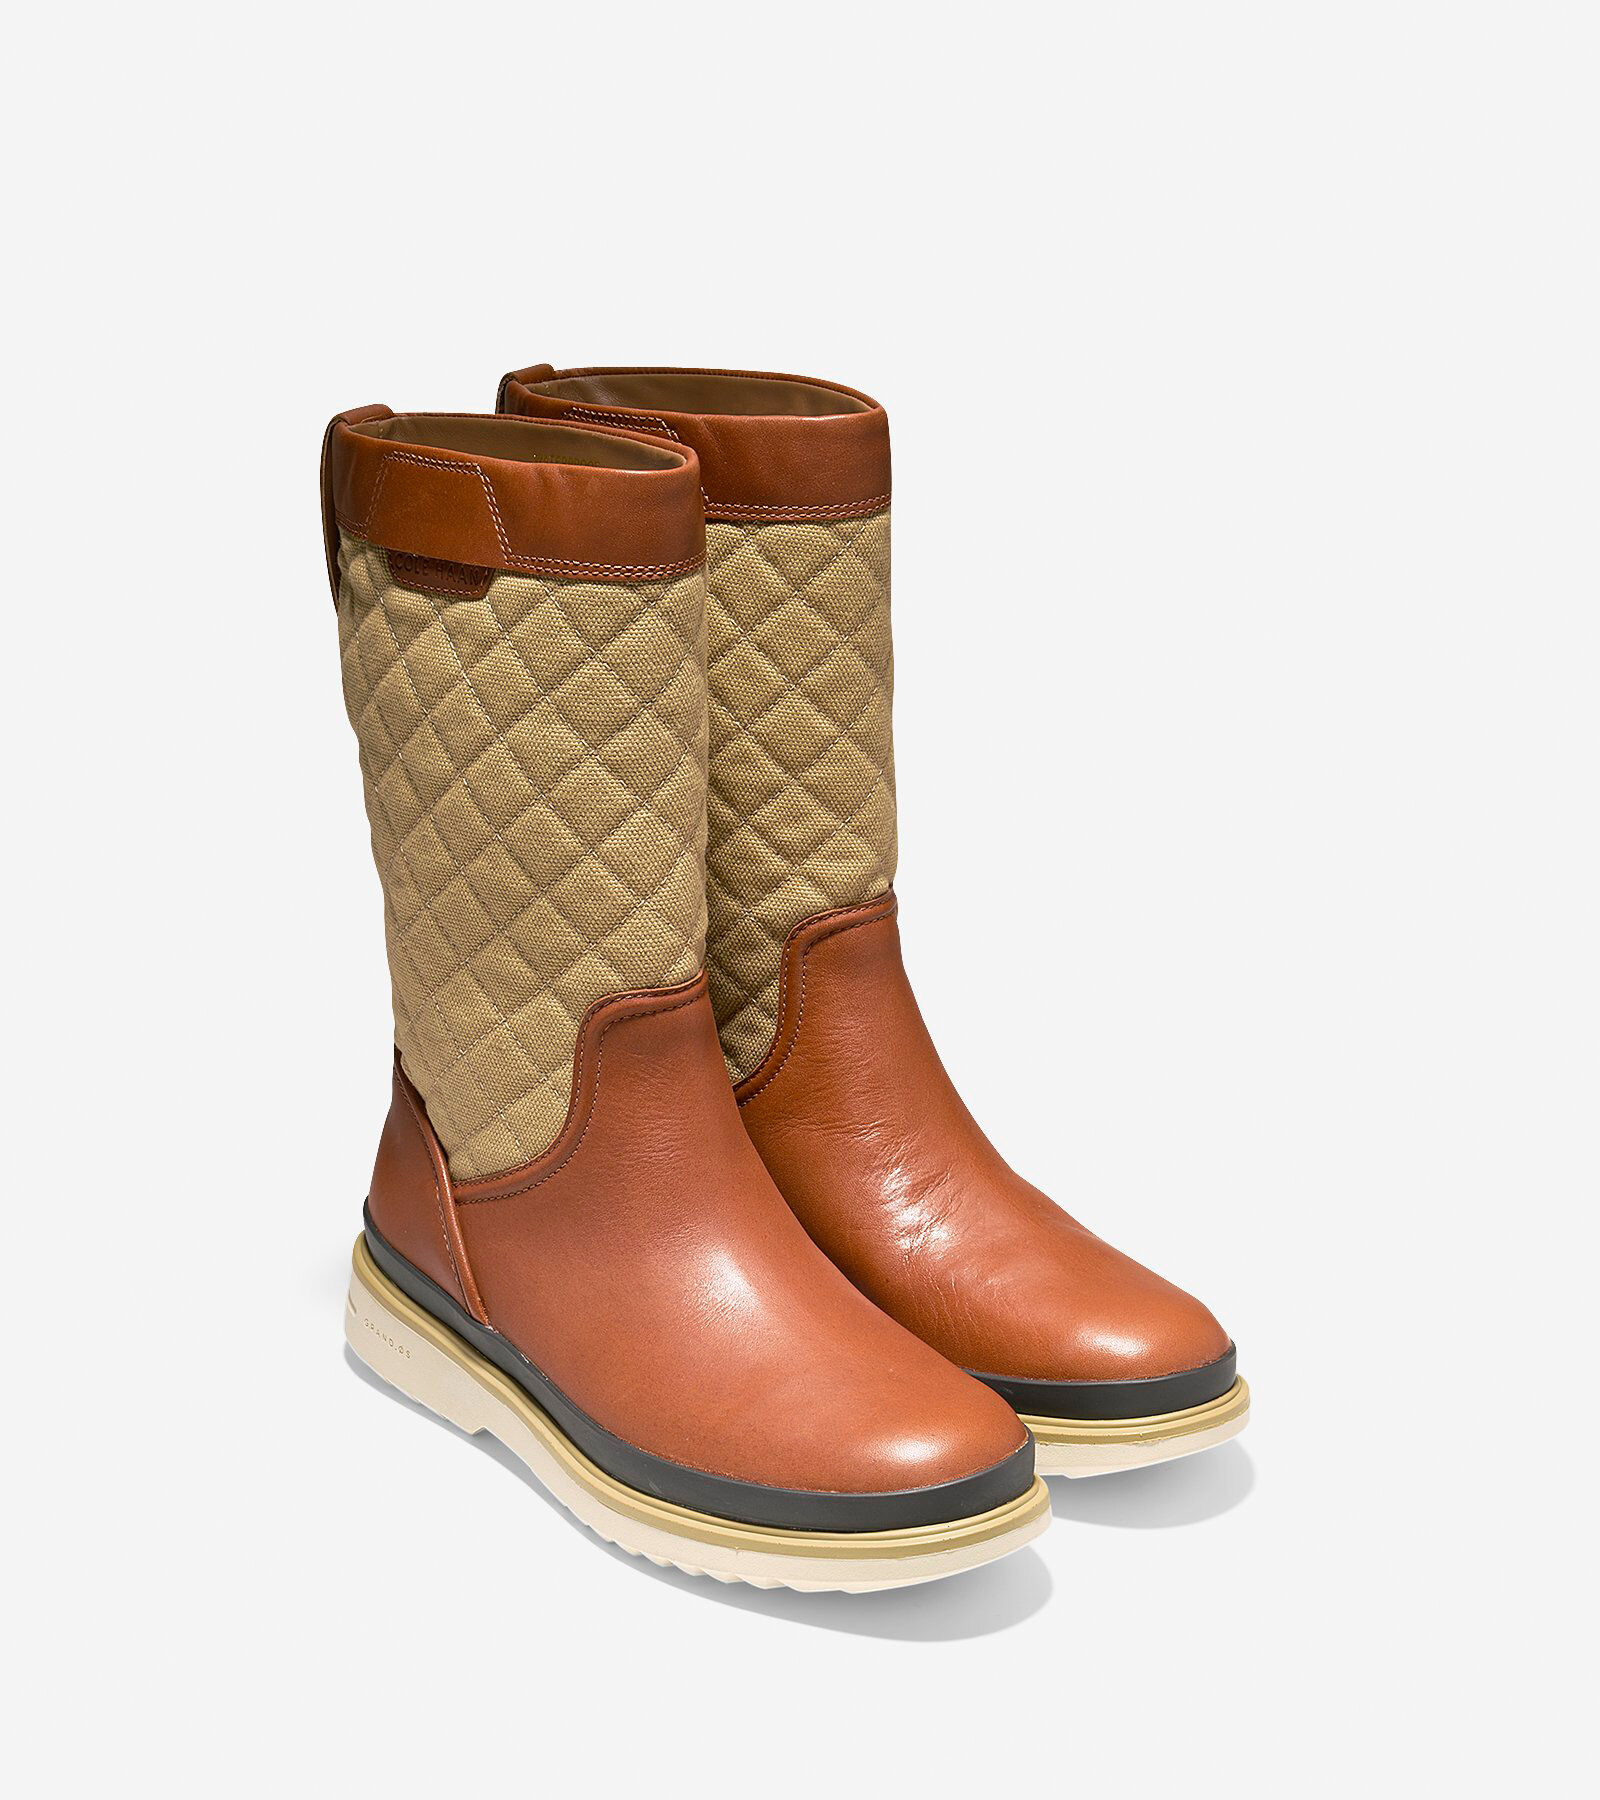 Cole Haan Millbridge Pull-On Boot Waterproof 3vU4PO3TZL